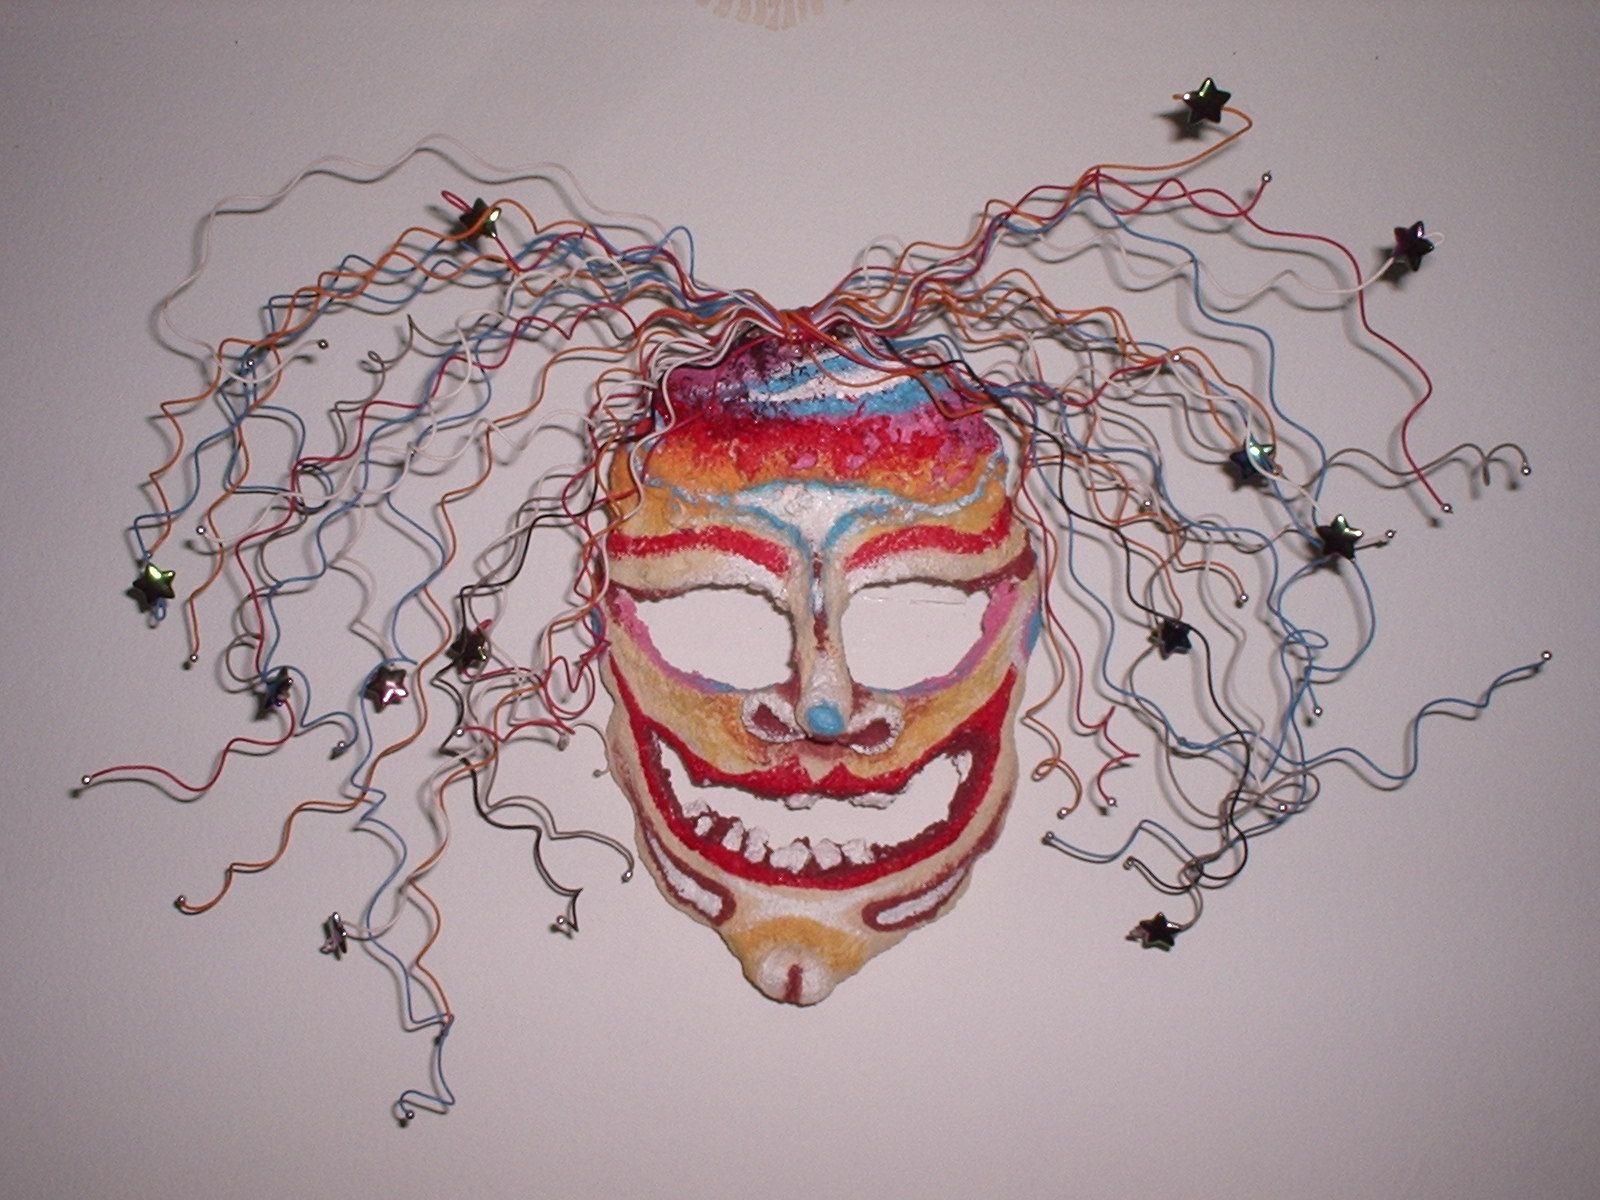 Bruxa colorida - Máscara em papel maché